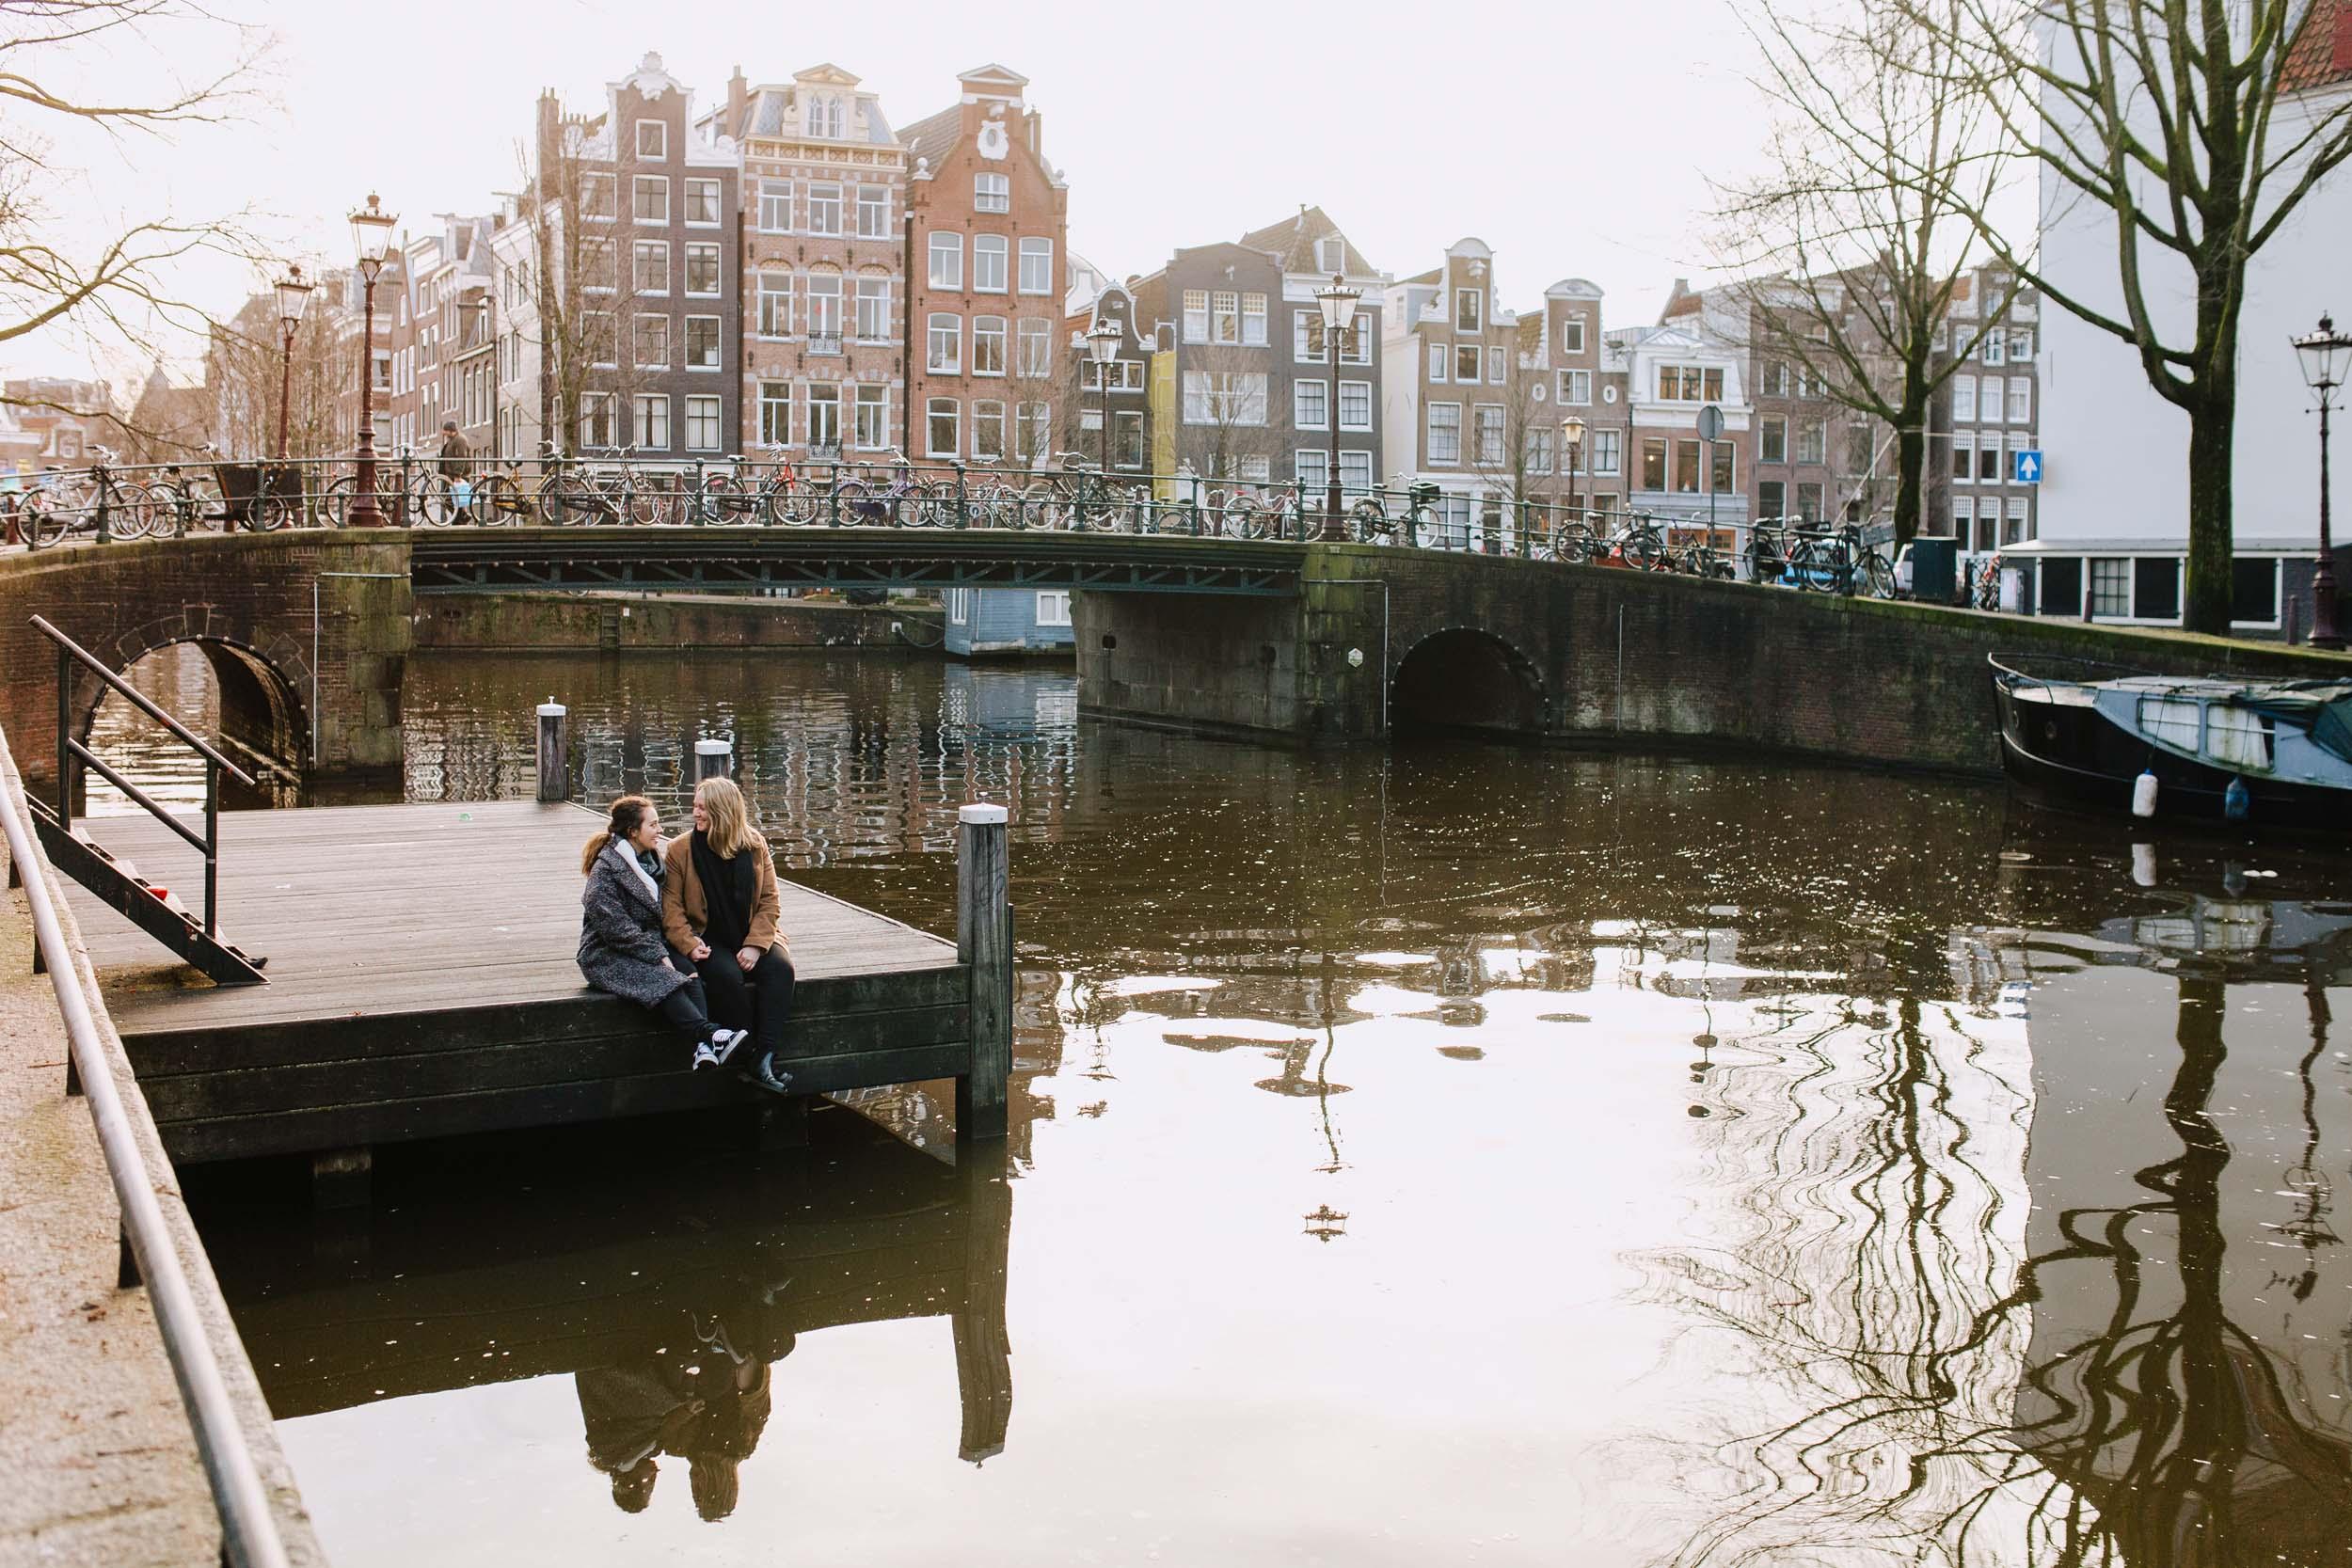 Flytographer Nadine W. in Amsterdam